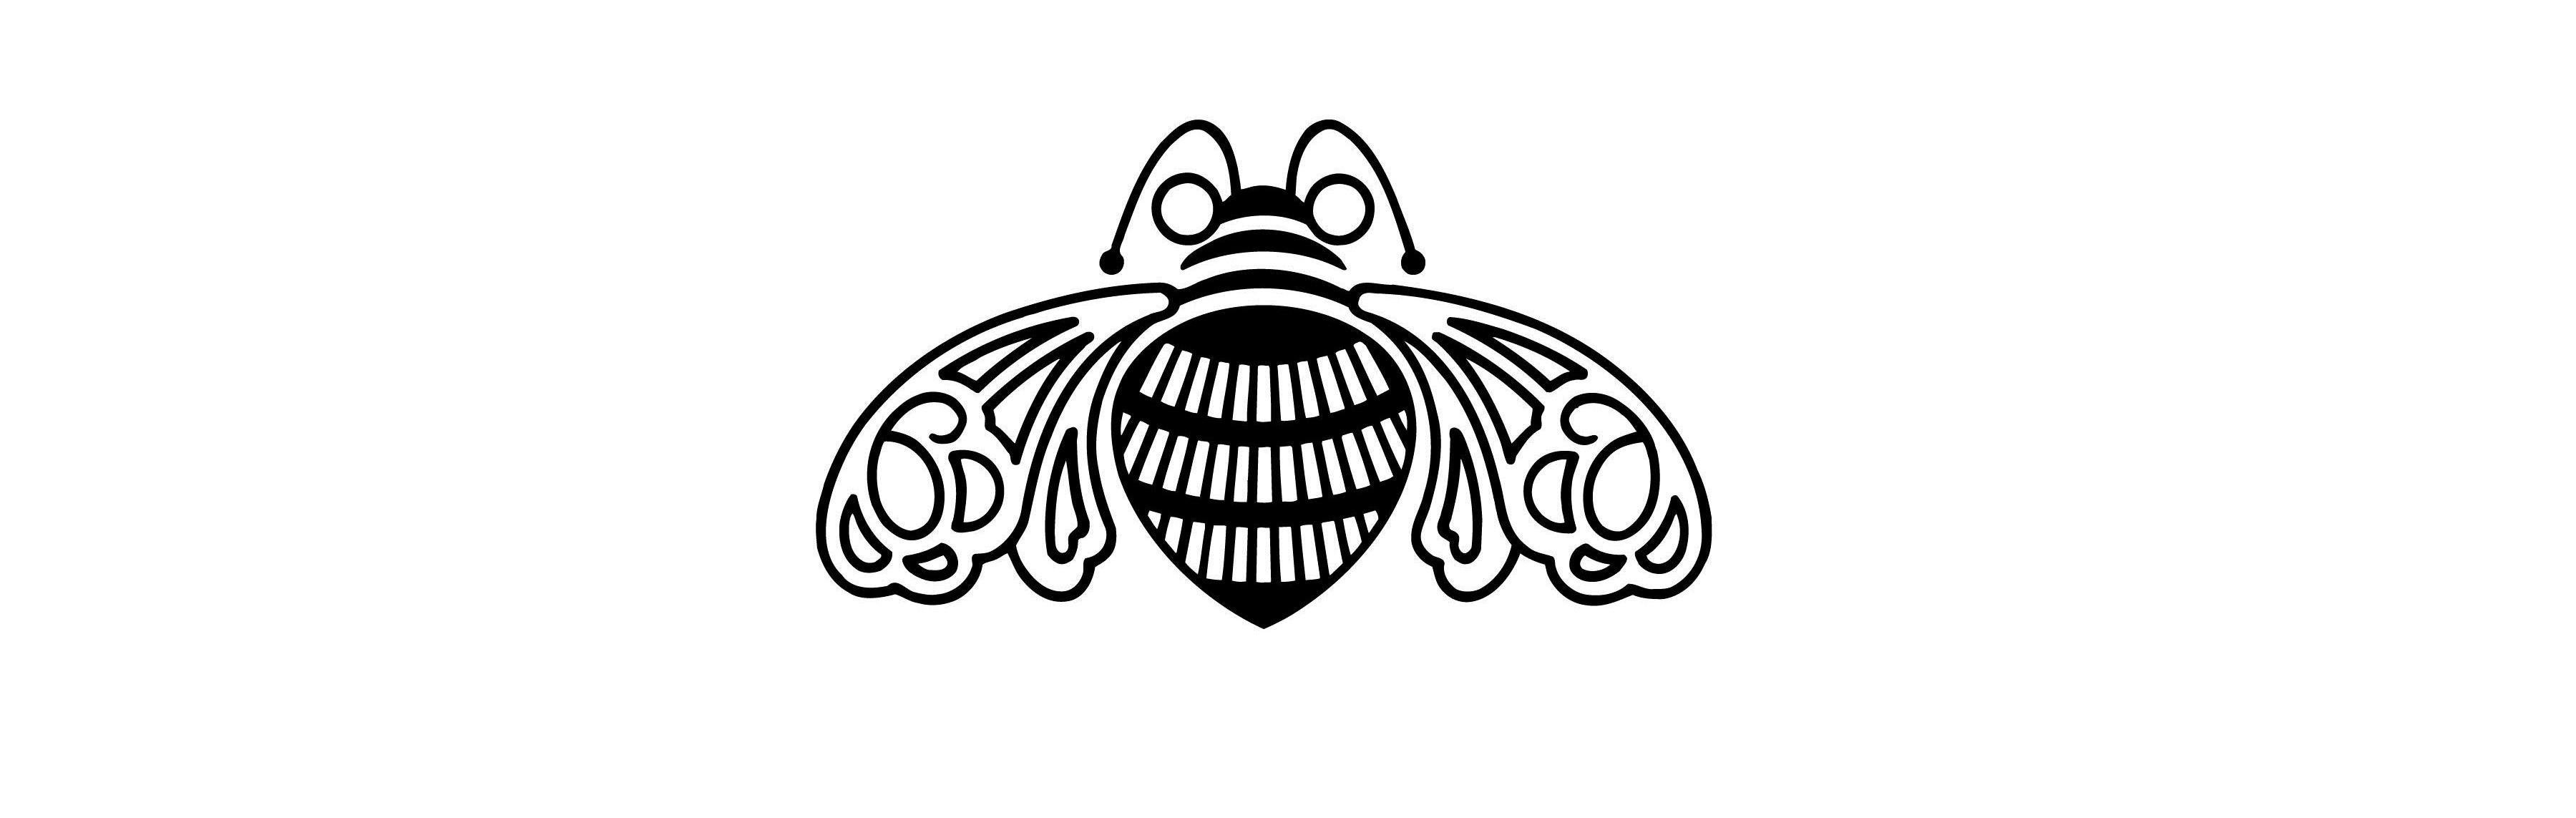 patron tequila logo vector related keywords patron